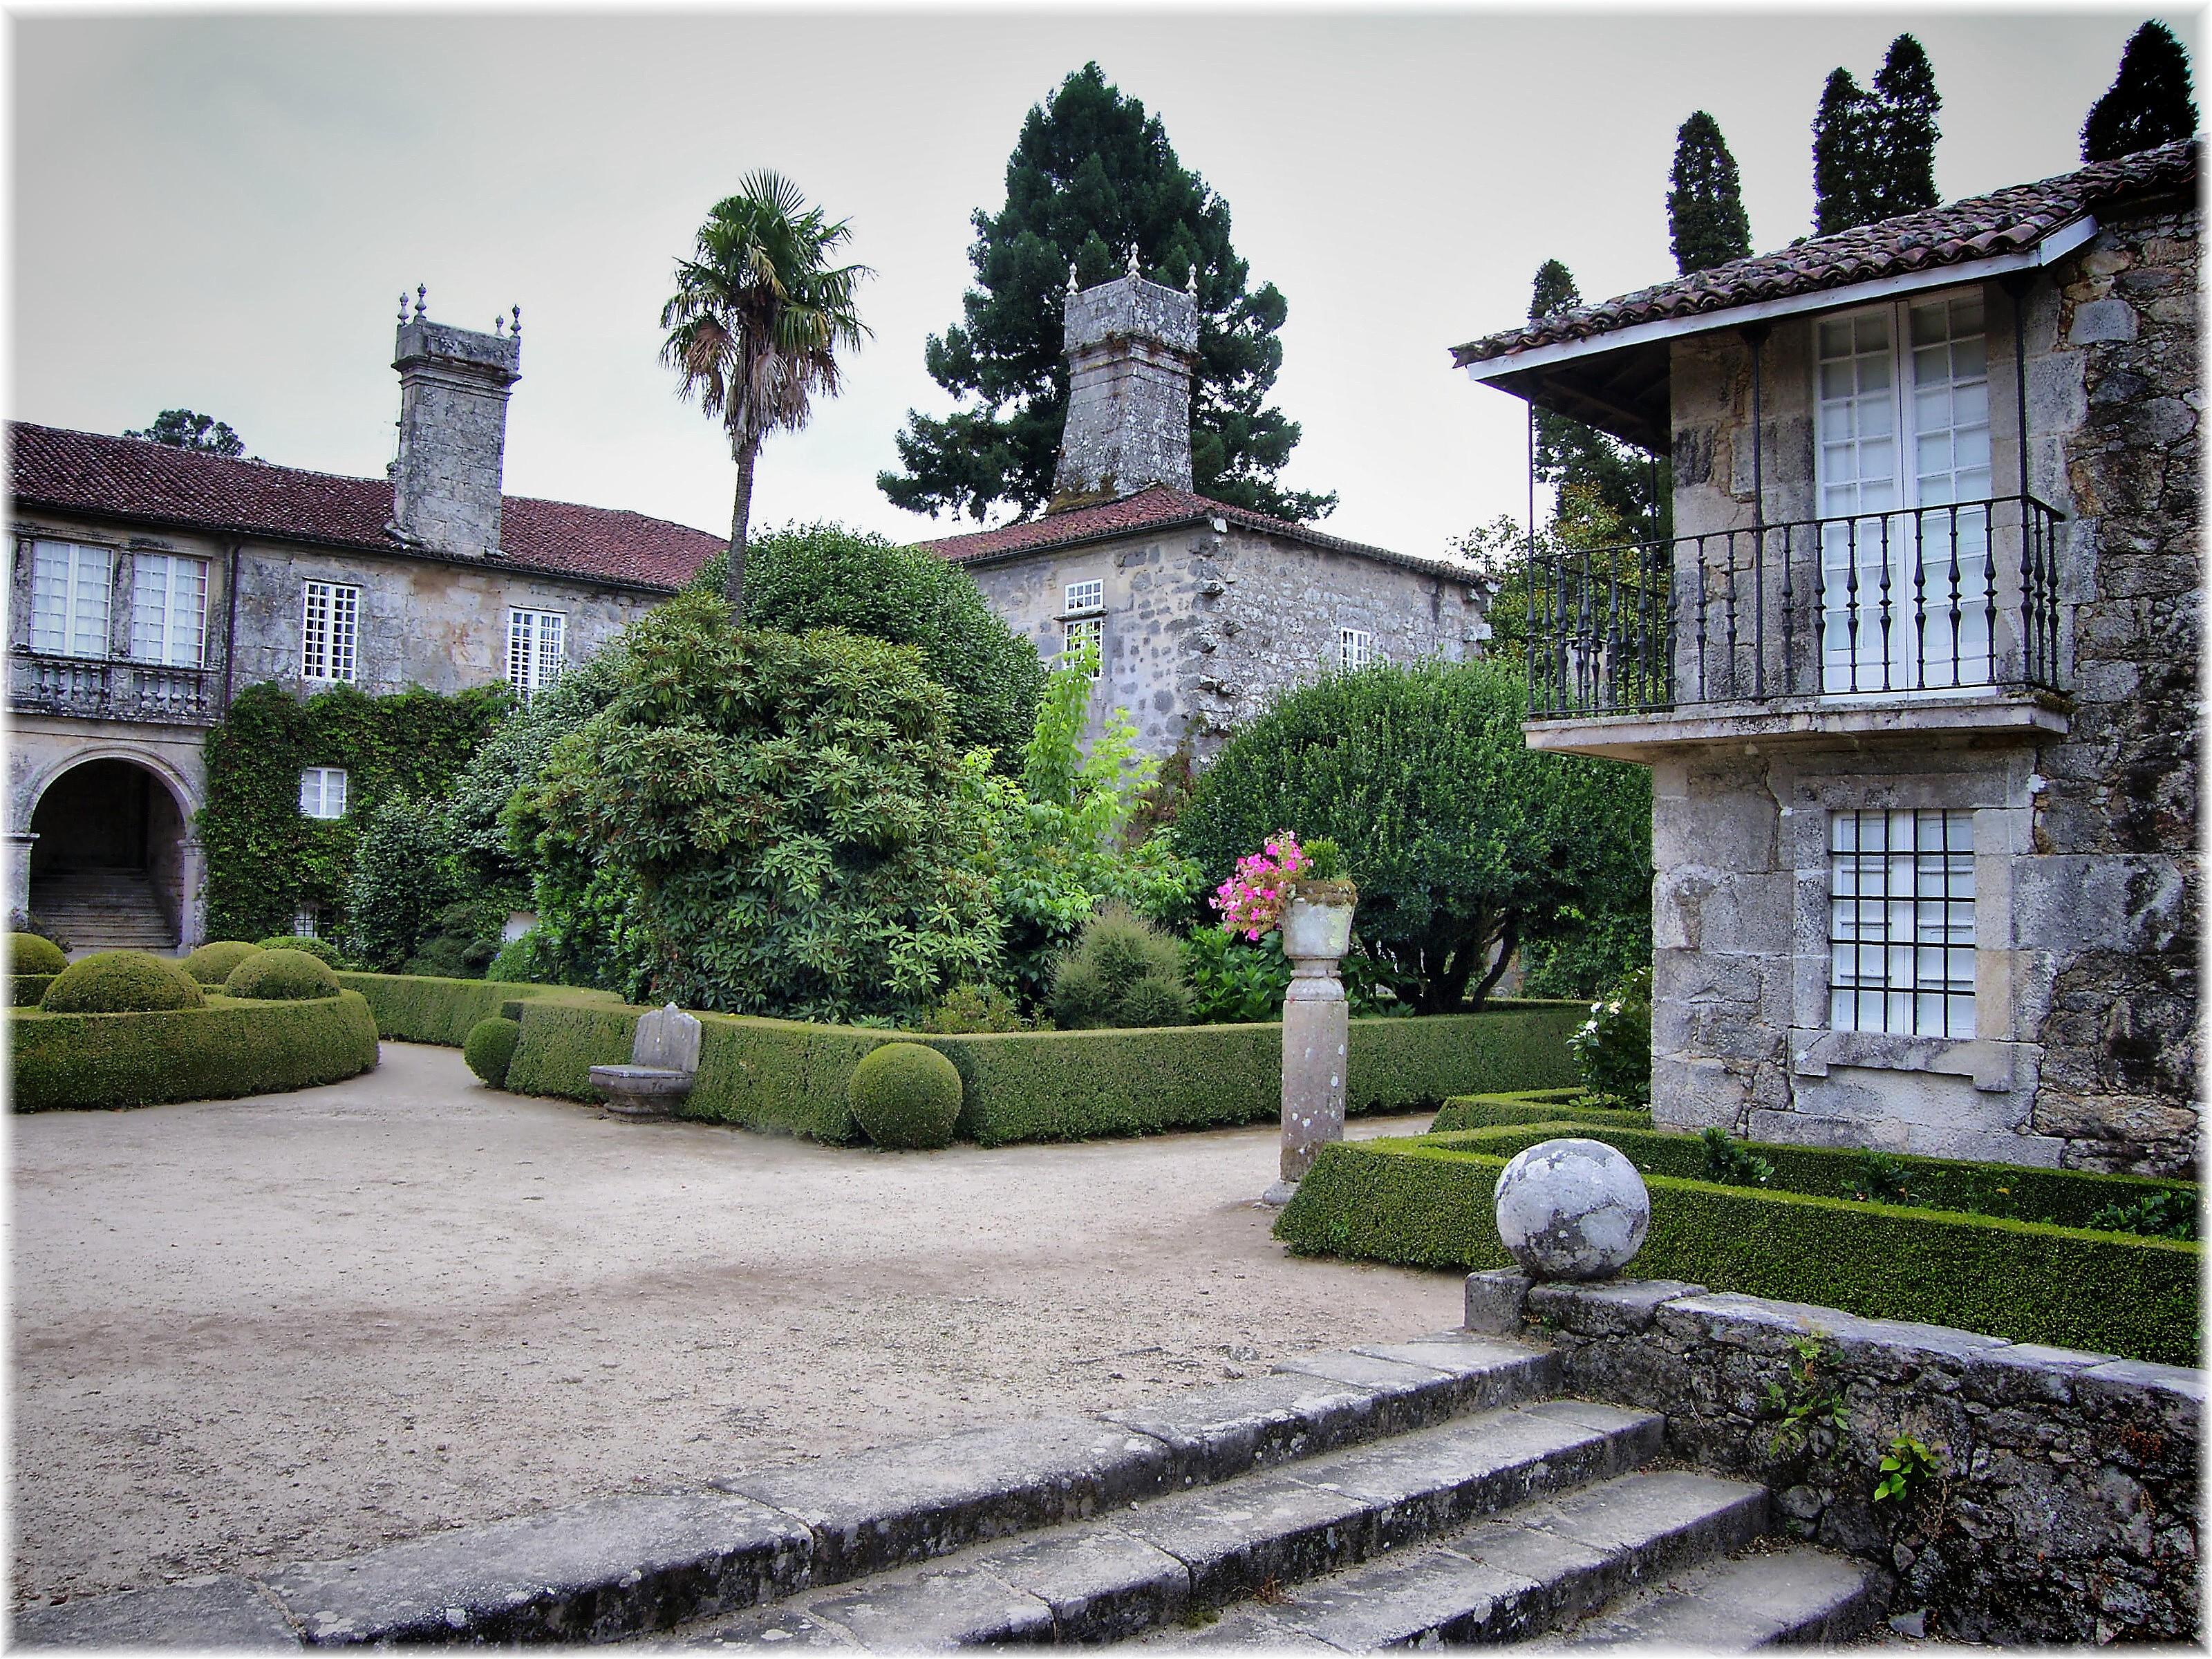 Fotos gratis arquitectura c sped palacio casa castillo pared pasarela suburbio europa - Ley propiedad horizontal patio interior ...